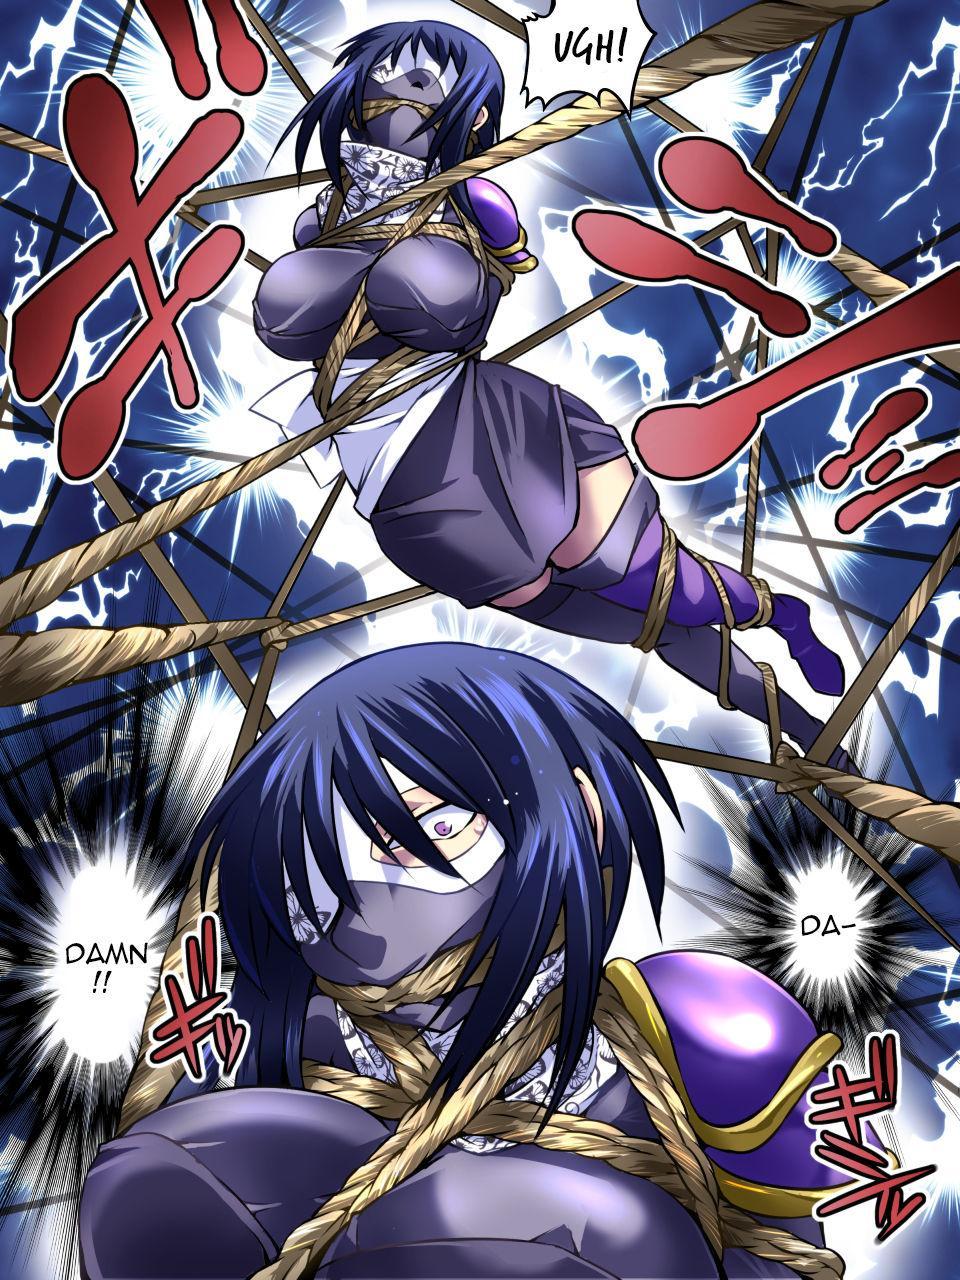 [Atelier Hachifukuan] Superheroine Yuukai Ryoujoku IV - Superheroine in Distress - Kunoichi Suzushiro [English] [Harasho Project] 16